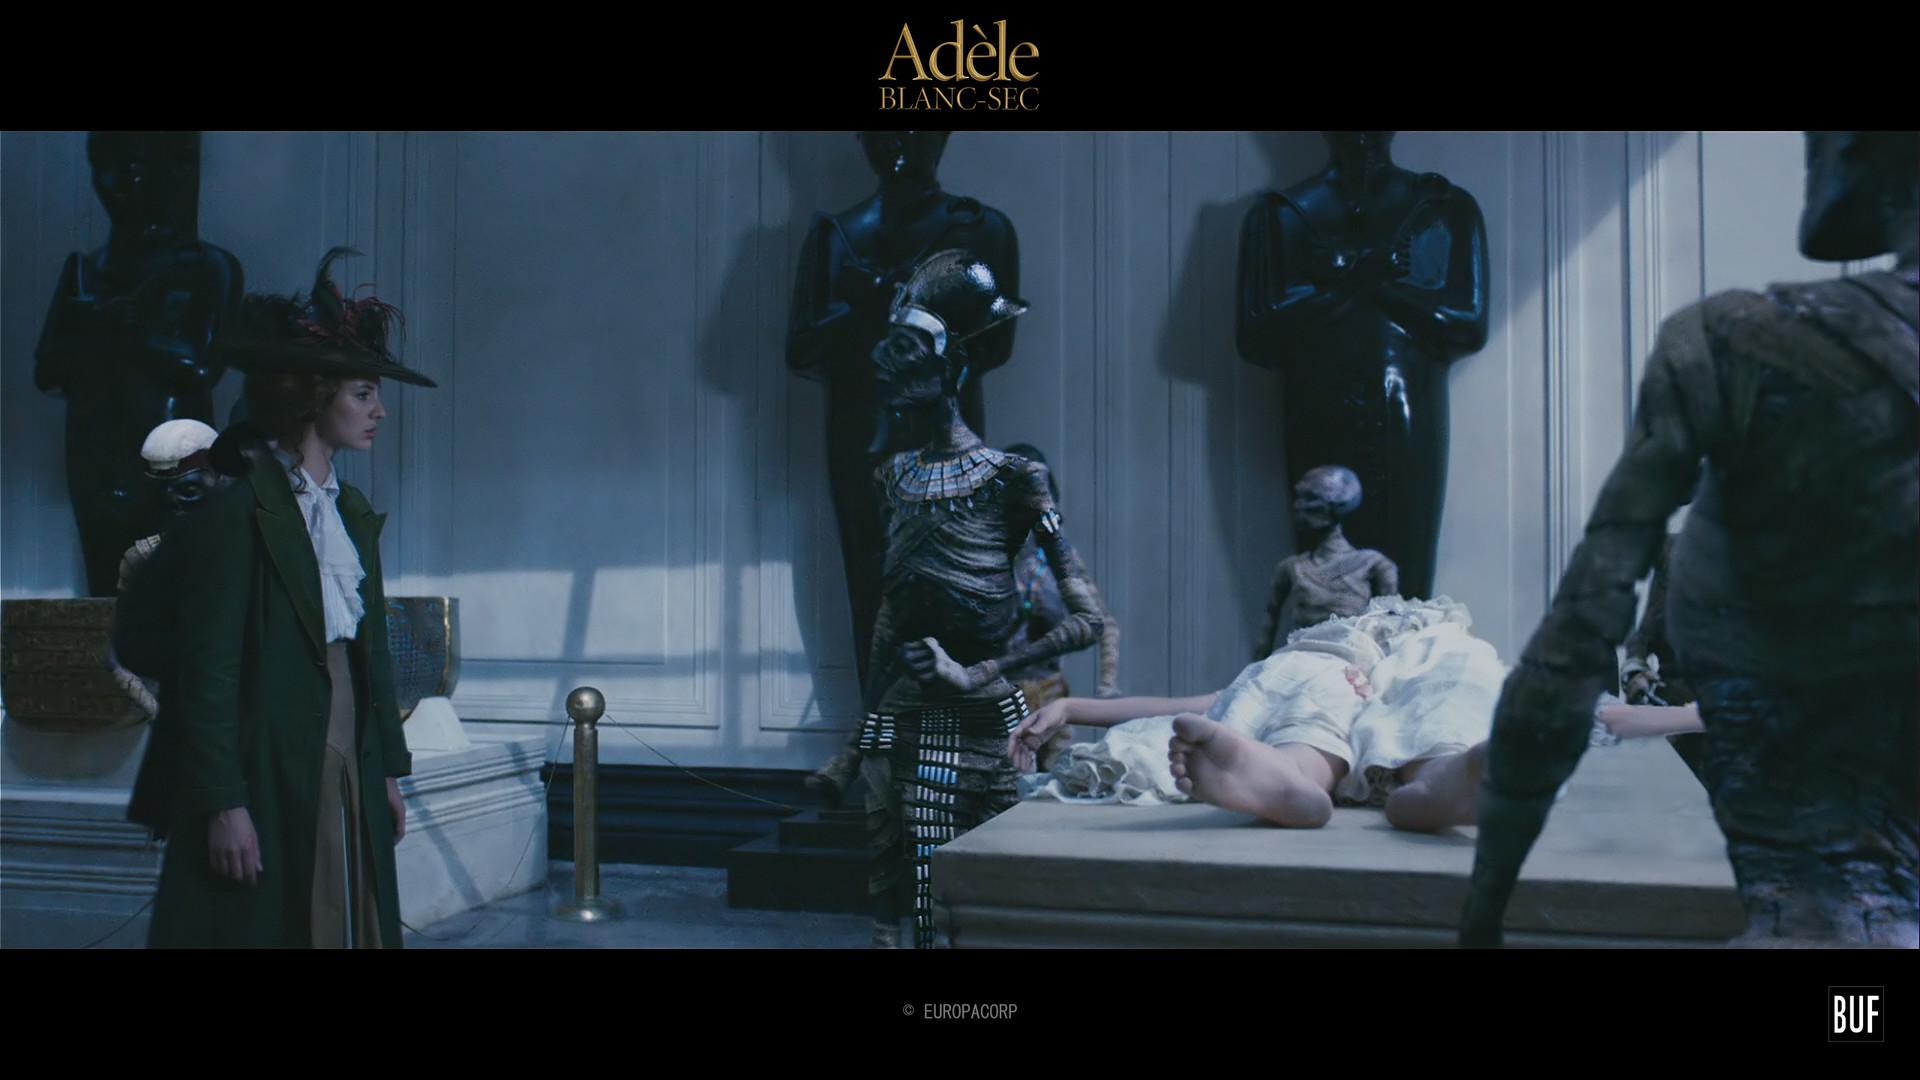 Nicolas boulaire seq mummy louvre 009